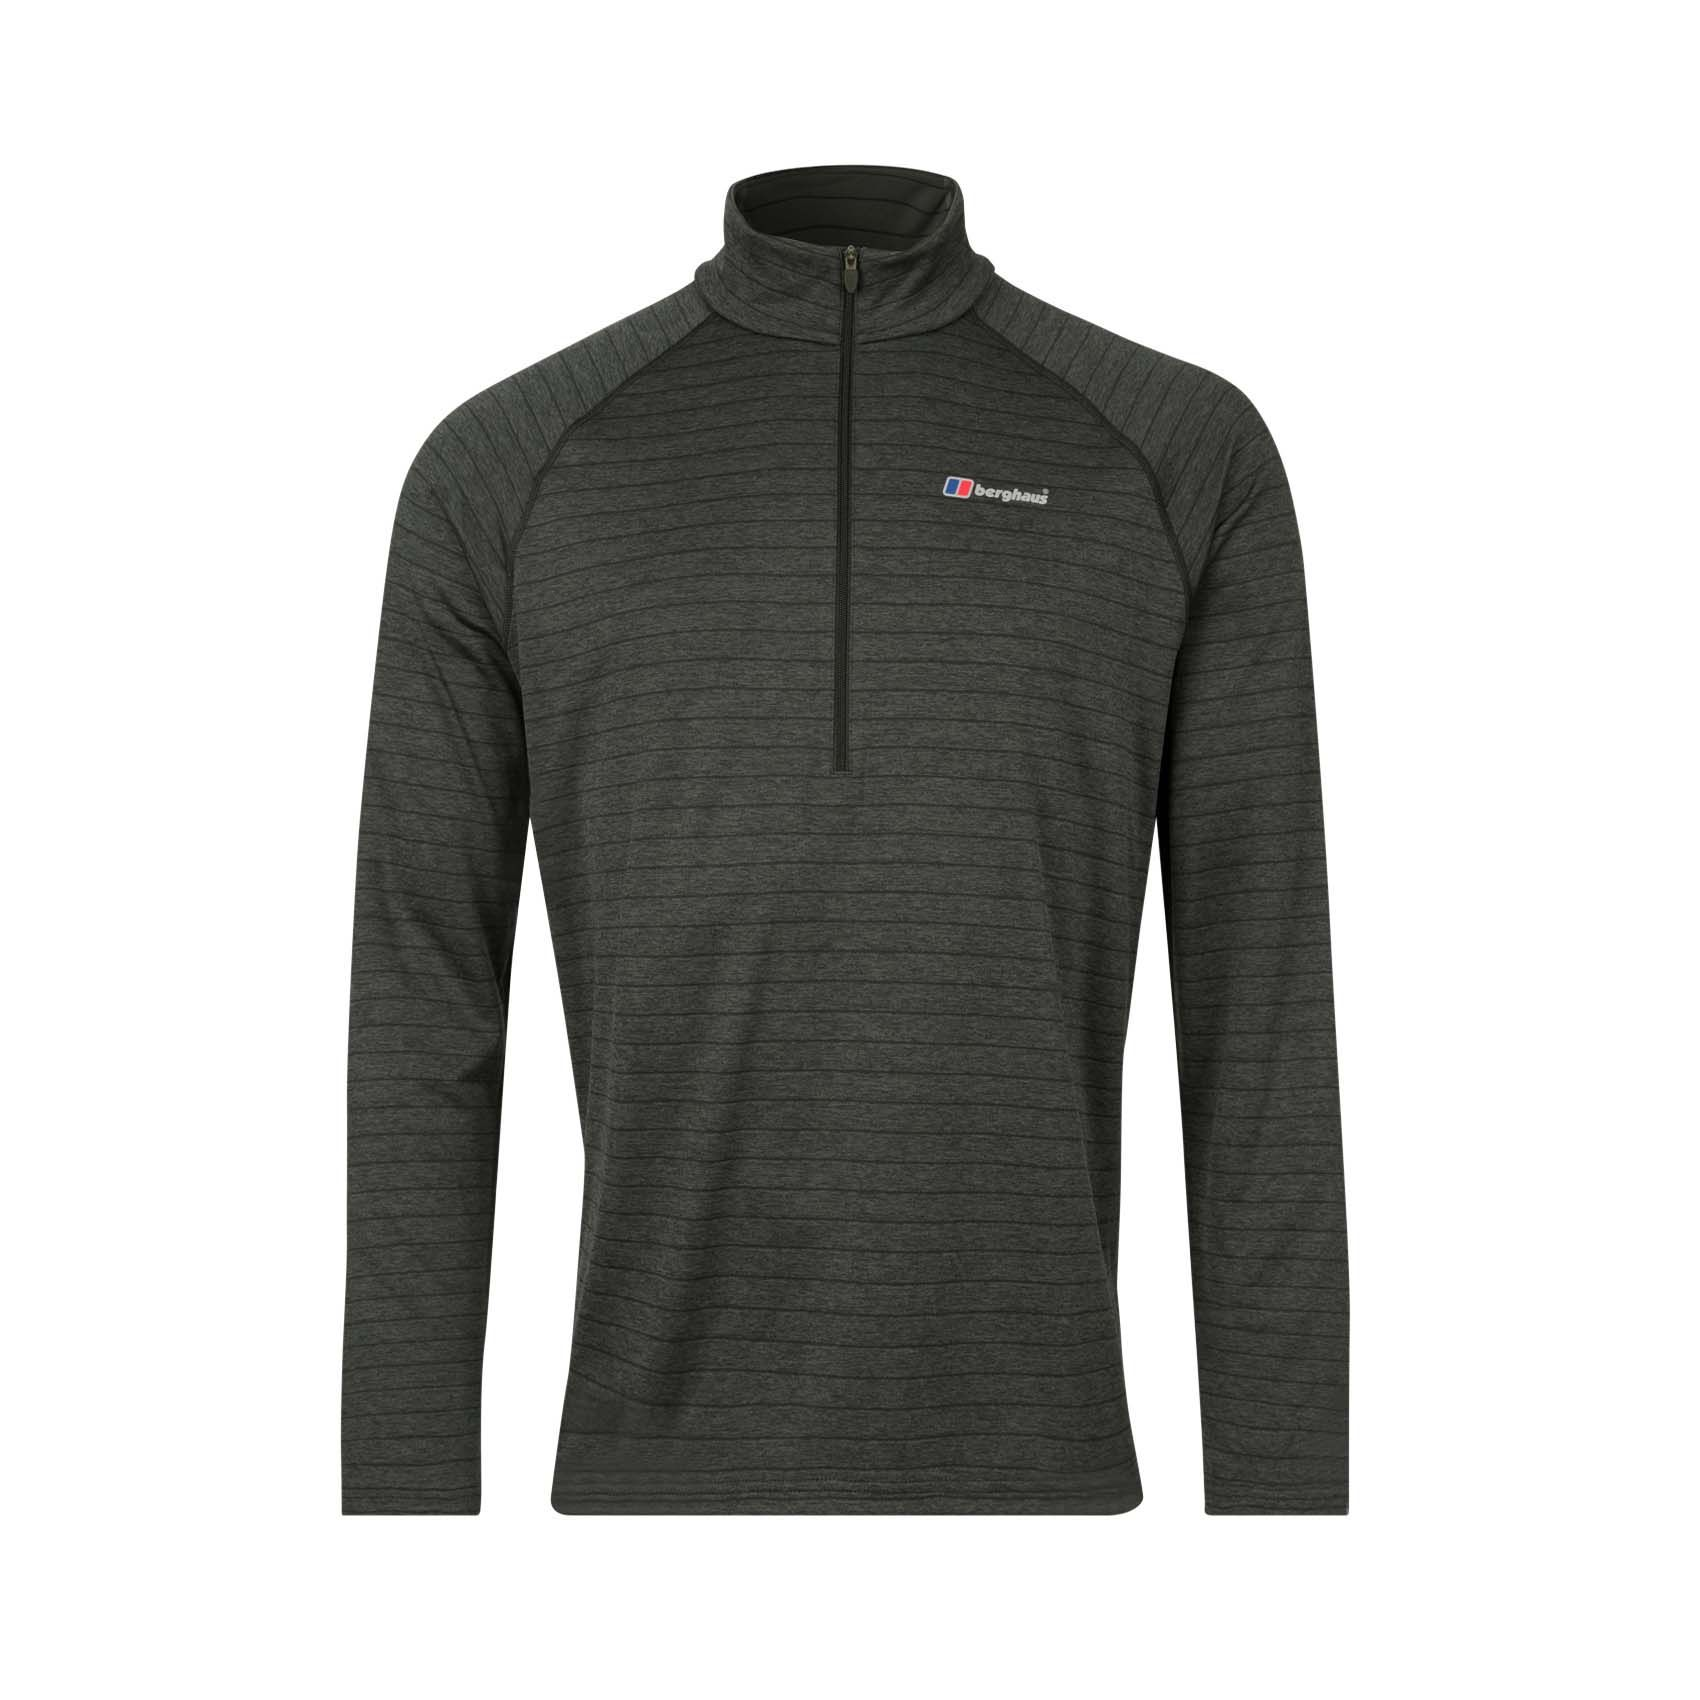 Berghaus Thermal Tech 1/2 Zip Mens Long Sleeve Shirt Grey - XXL